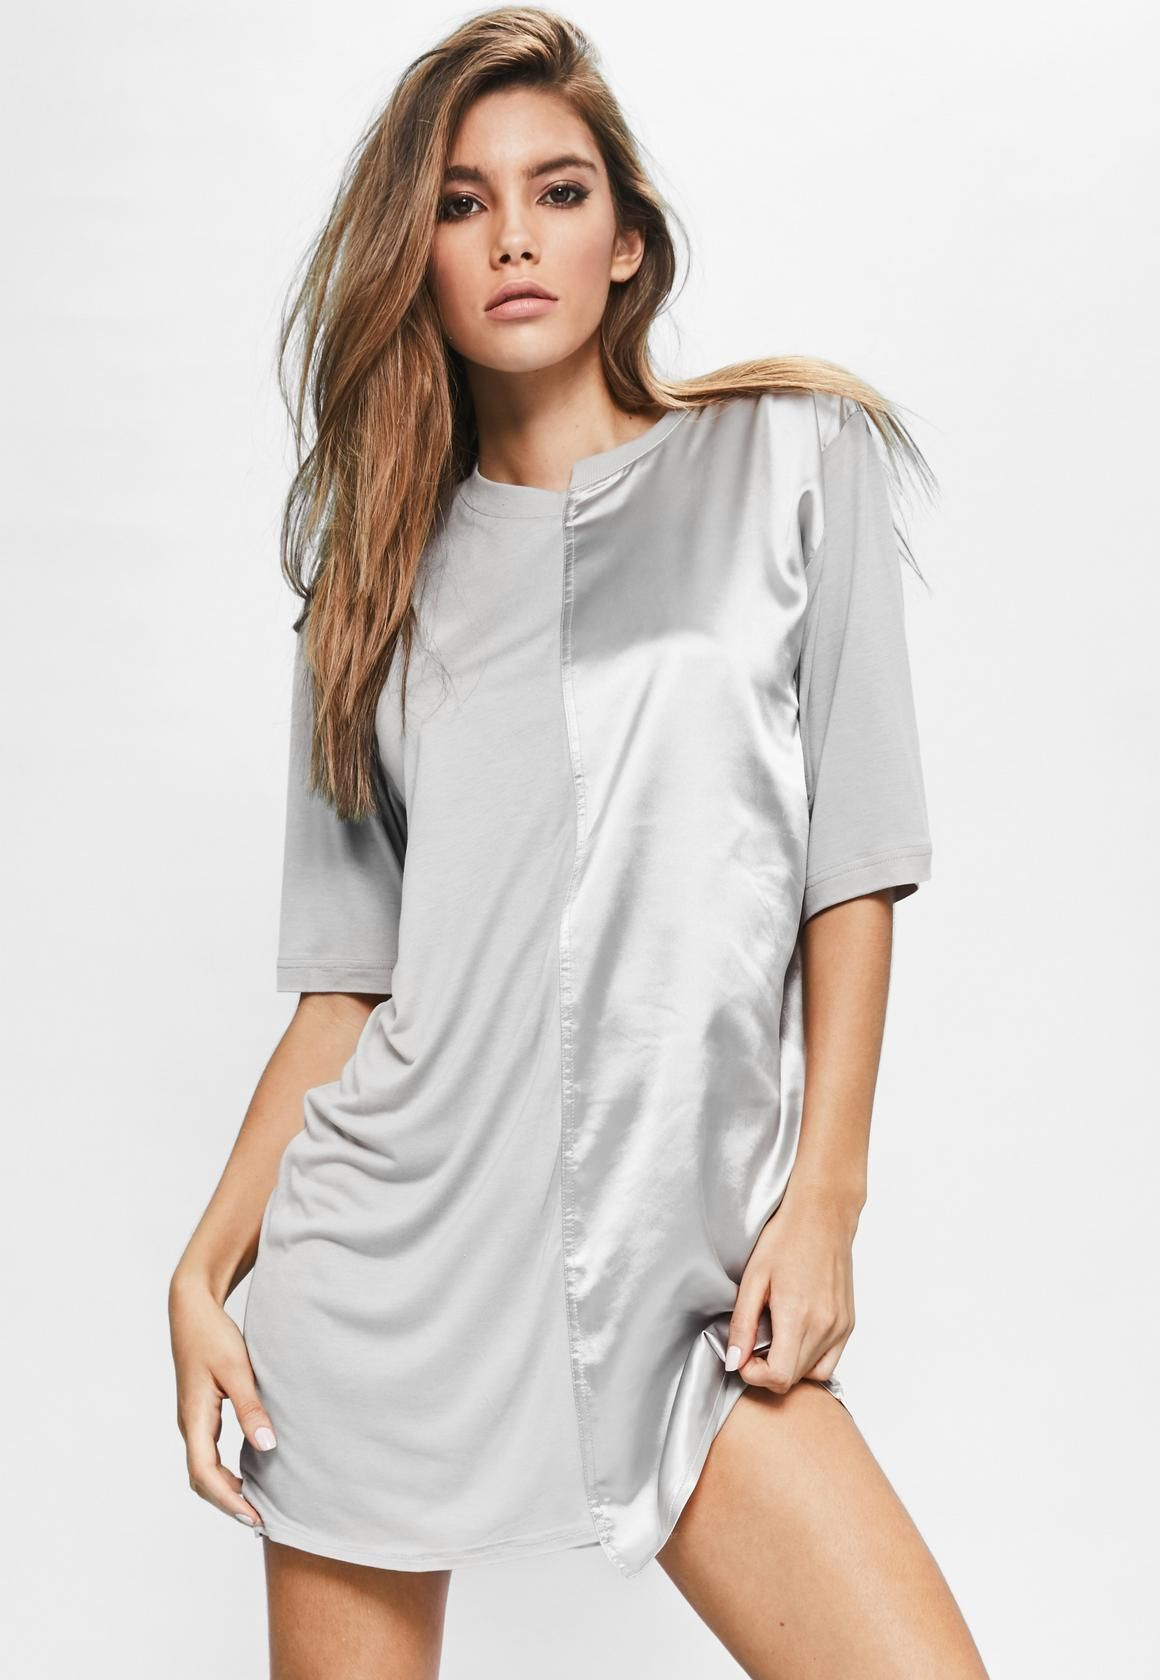 ea1aec349d1 Londunn + Missguided Grey Spliced Satin Jersey T-shirt Dress - Missguided